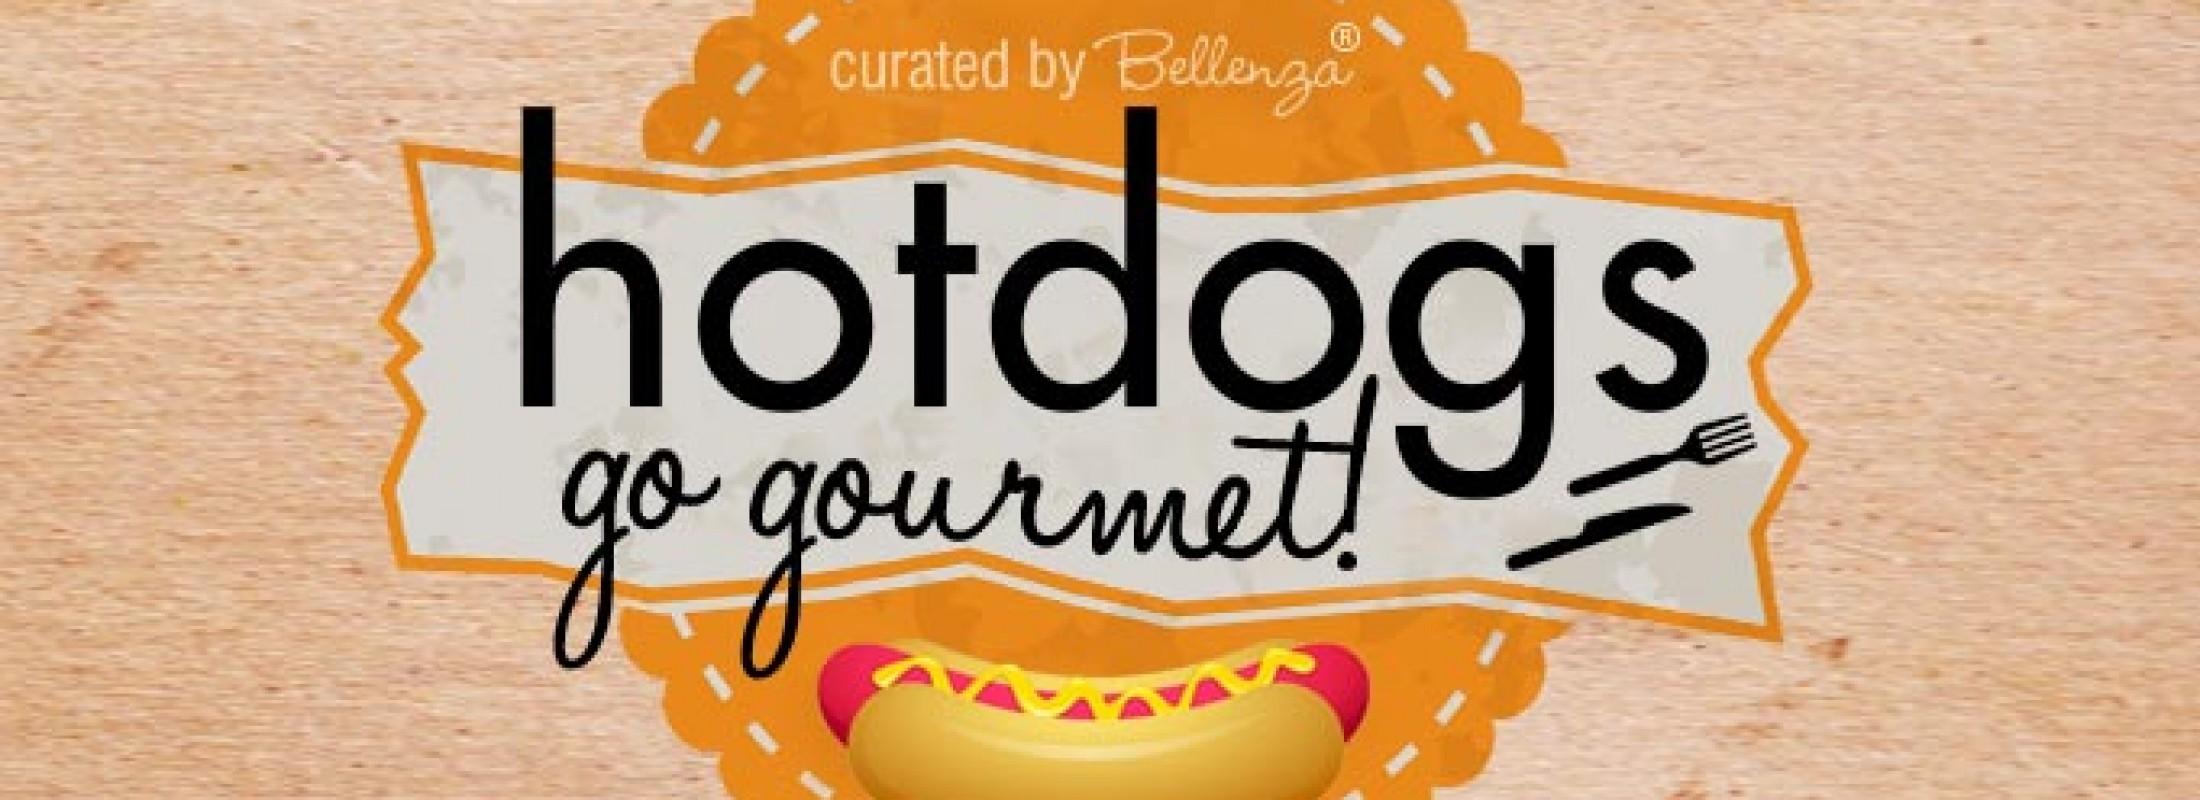 Hot dogs go gourmet!